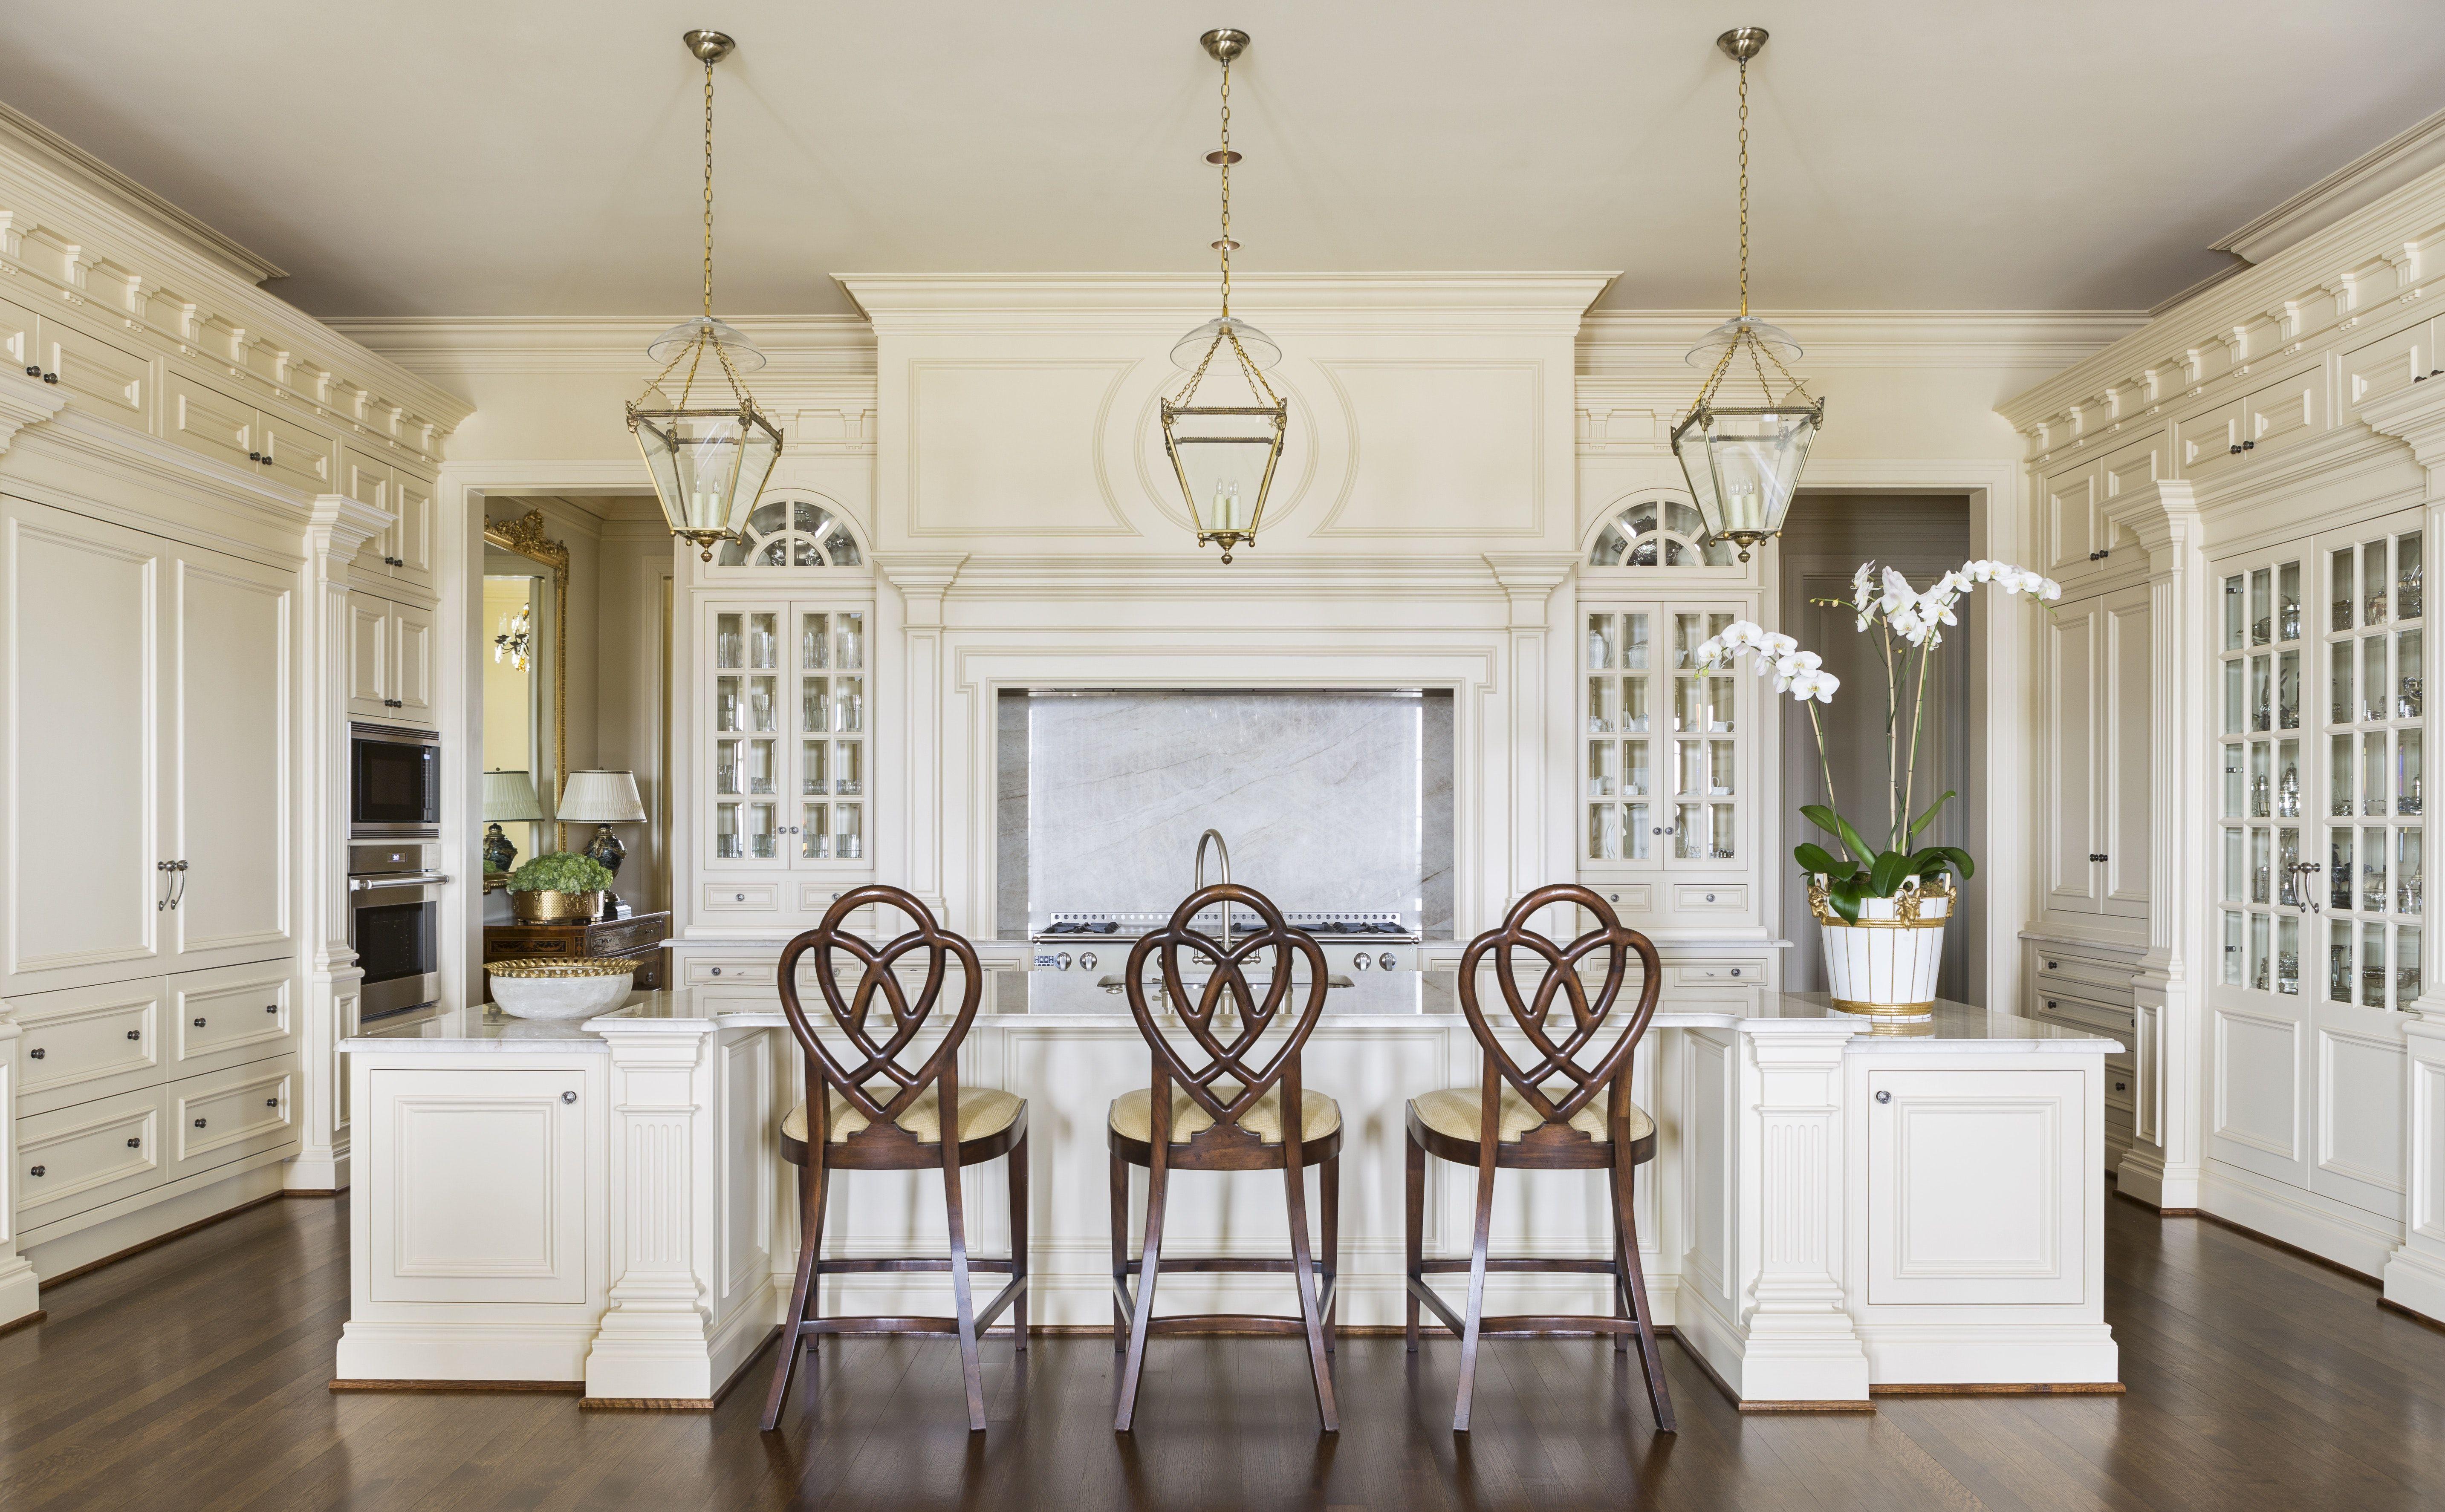 Heather Hungeling Design Interior Designer In Atlanta Ga 30309